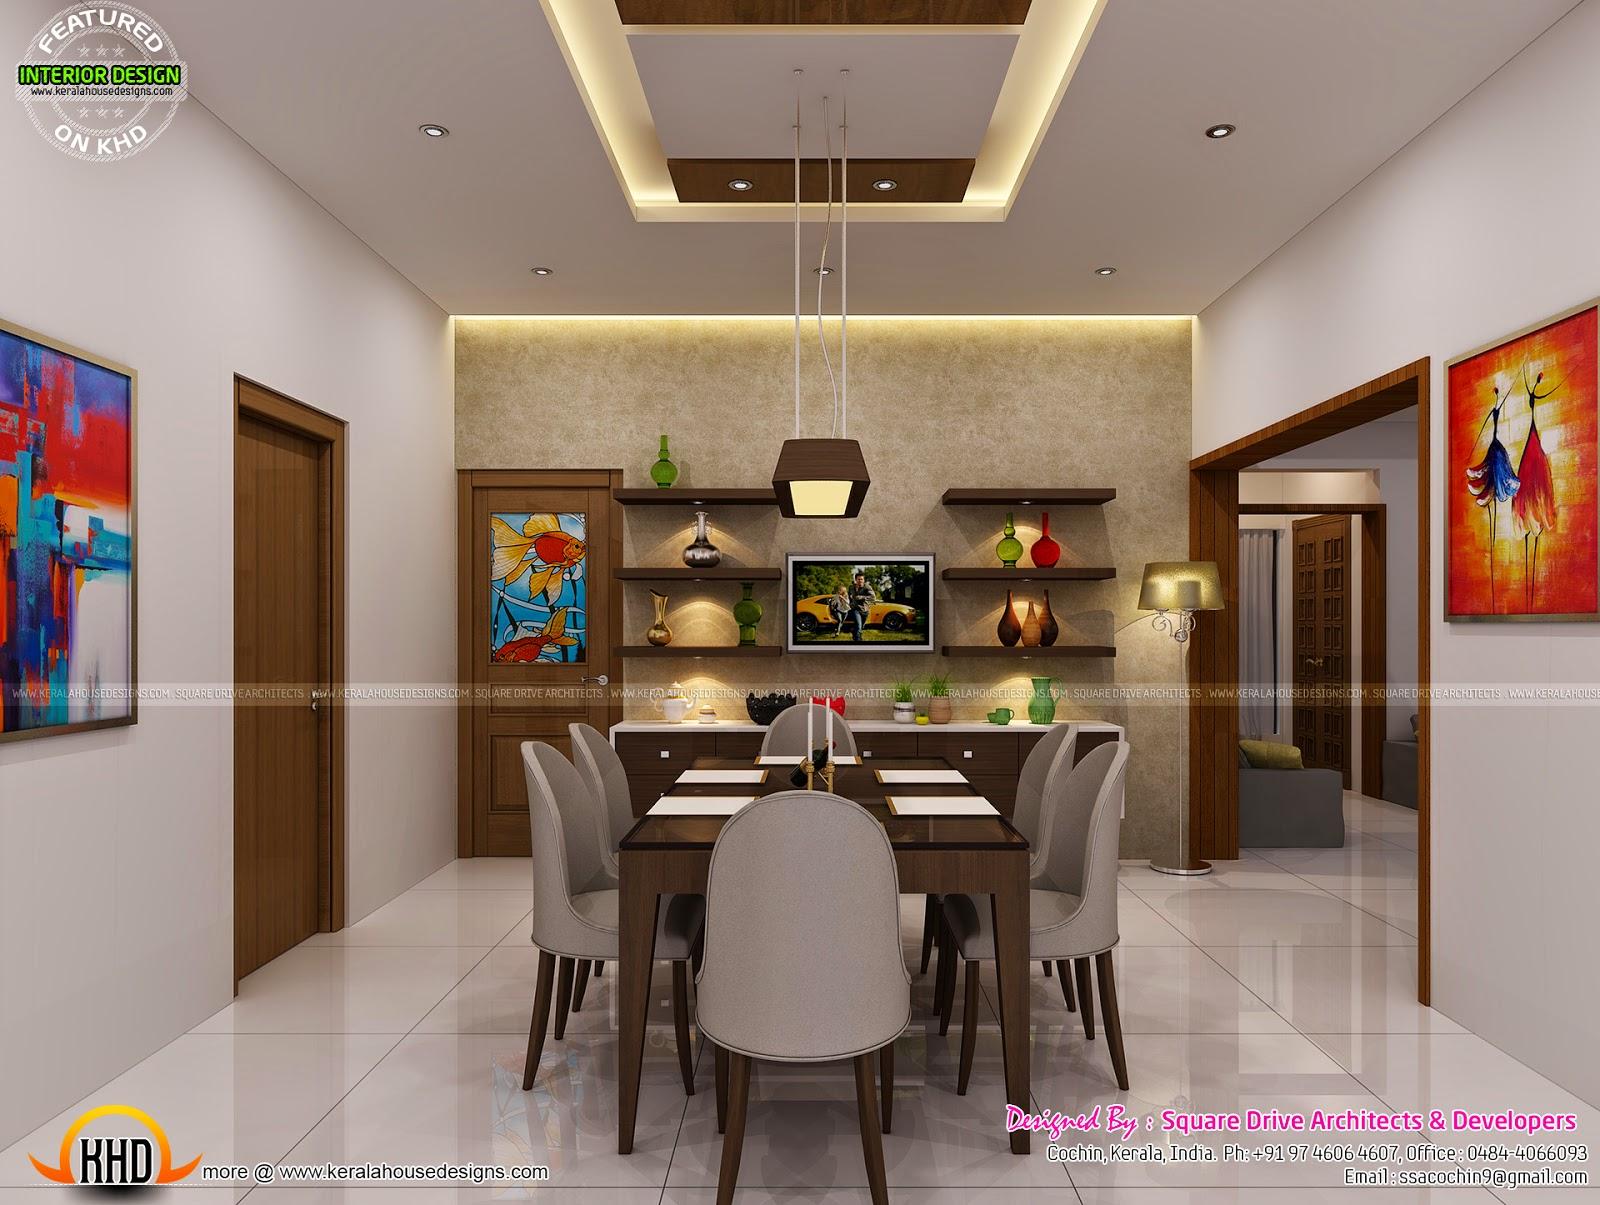 Interior decor by square drive architects kerala home